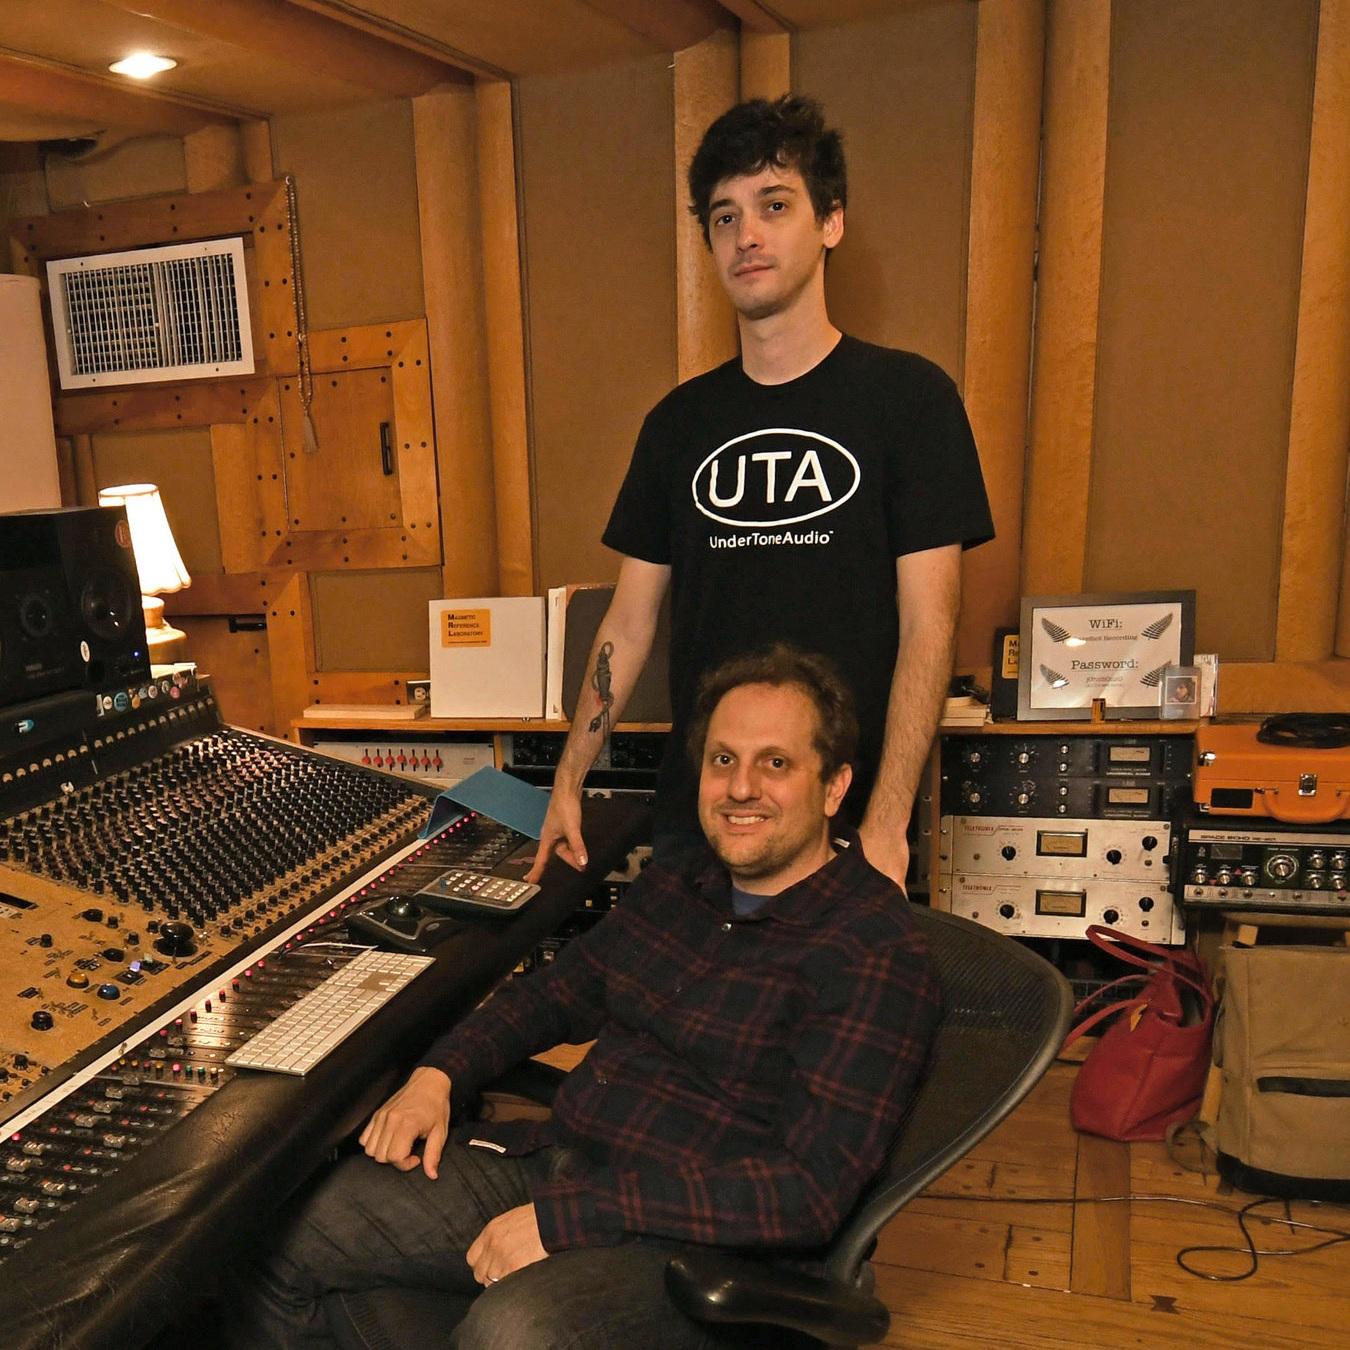 Tim O'Sullivan and Joe Napolitano, the producers/engineers in Studio B